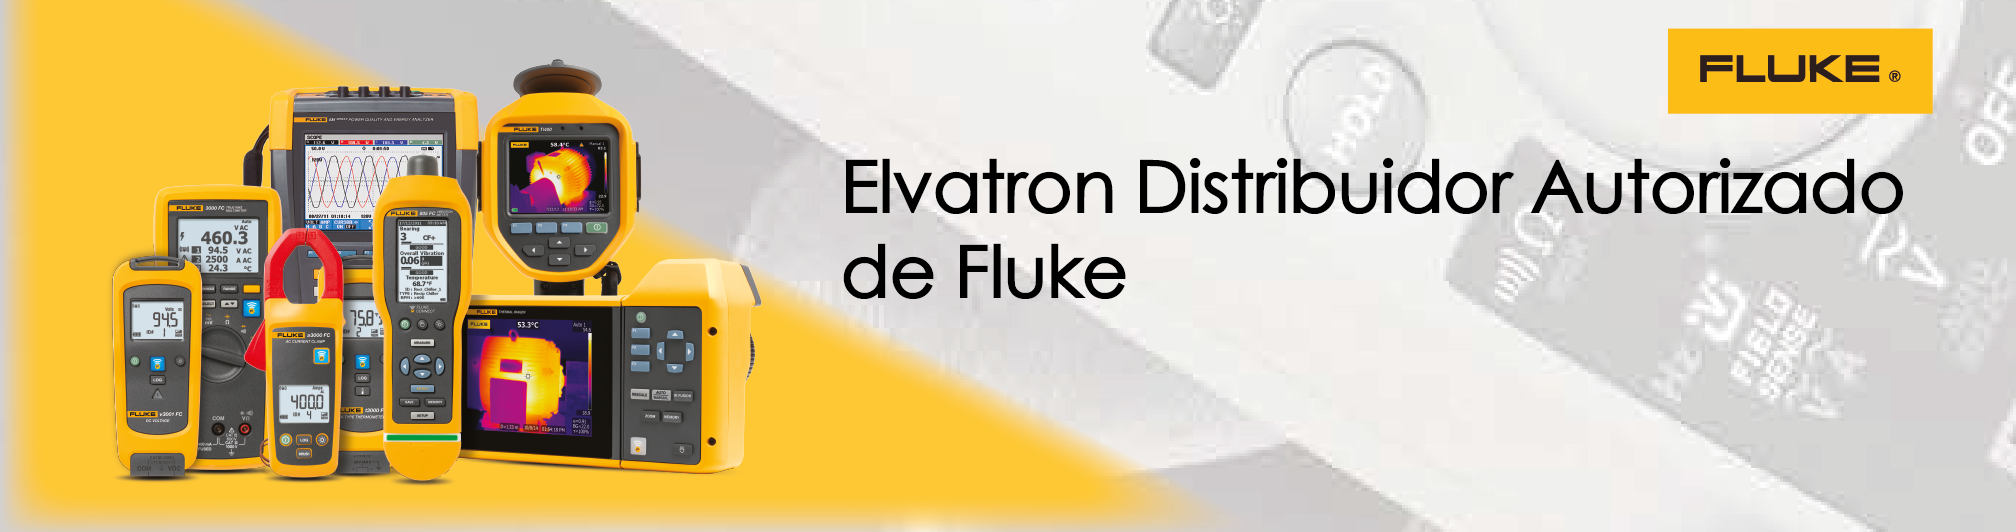 banner fluke form_Mesa de trabajo 1-3